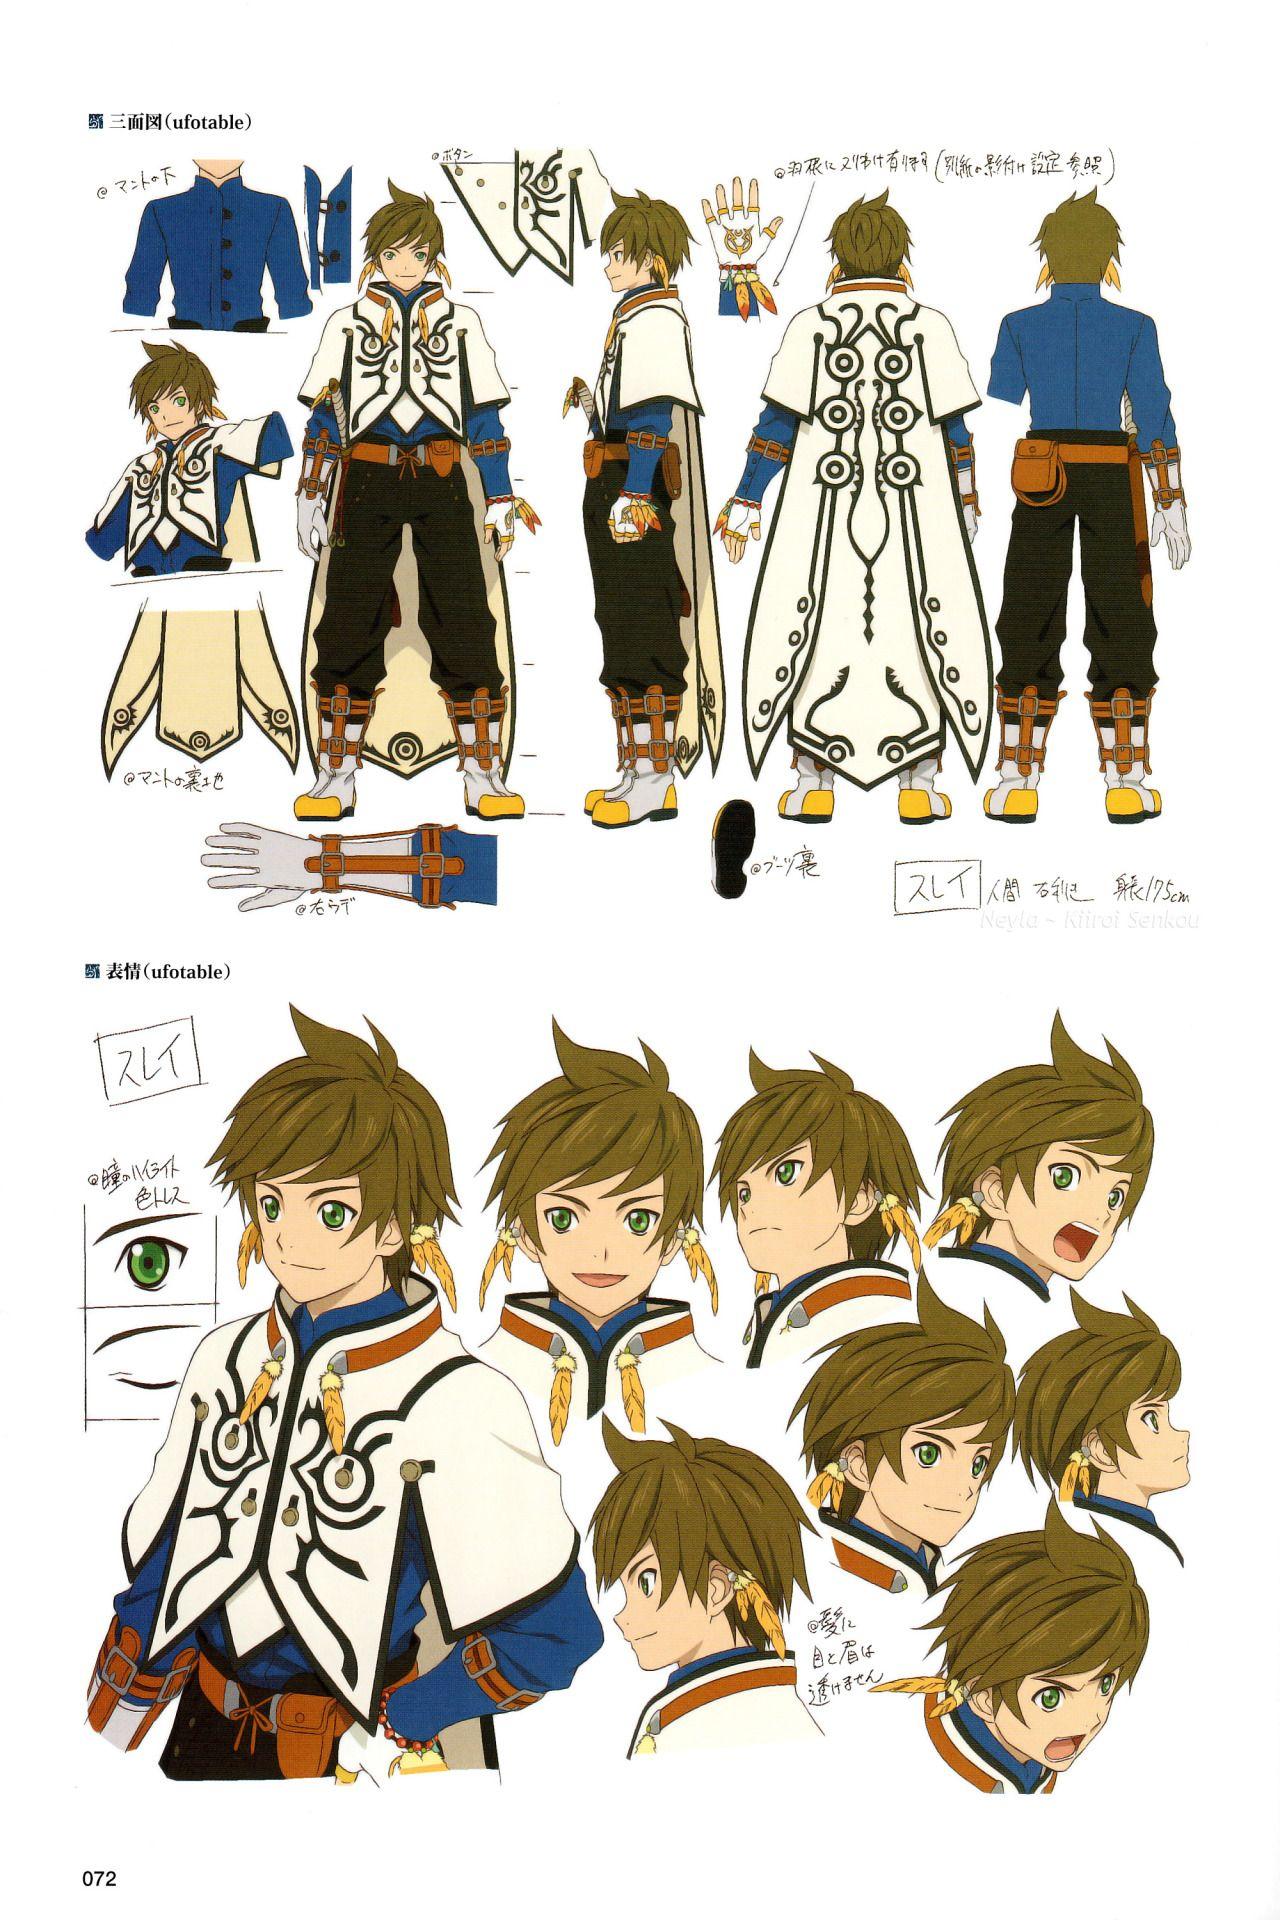 Tales of Zestiria larp clothing Pinterest Anime